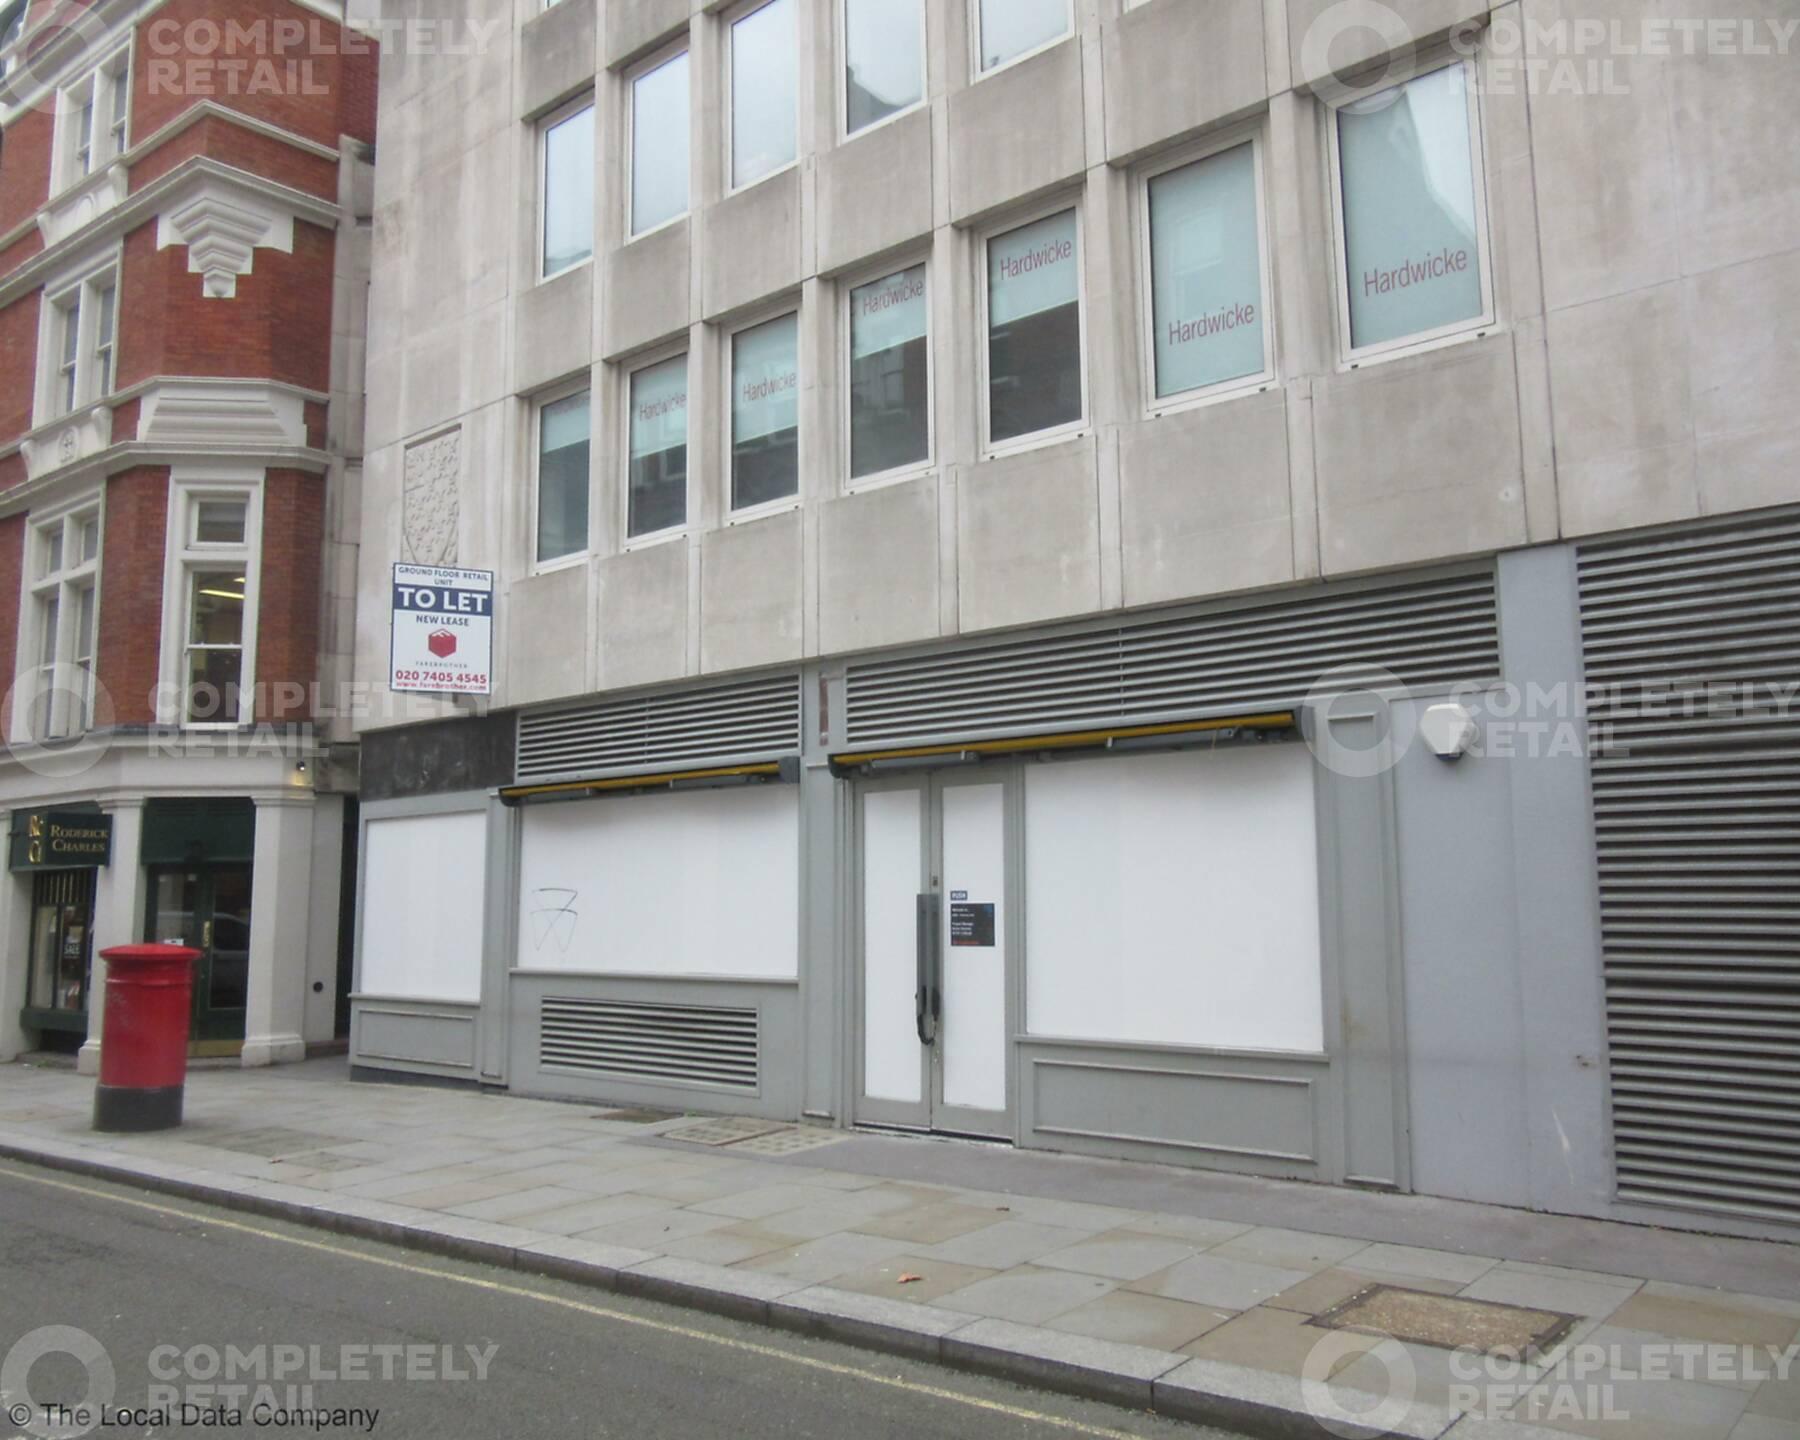 77-78 Chancery Lane